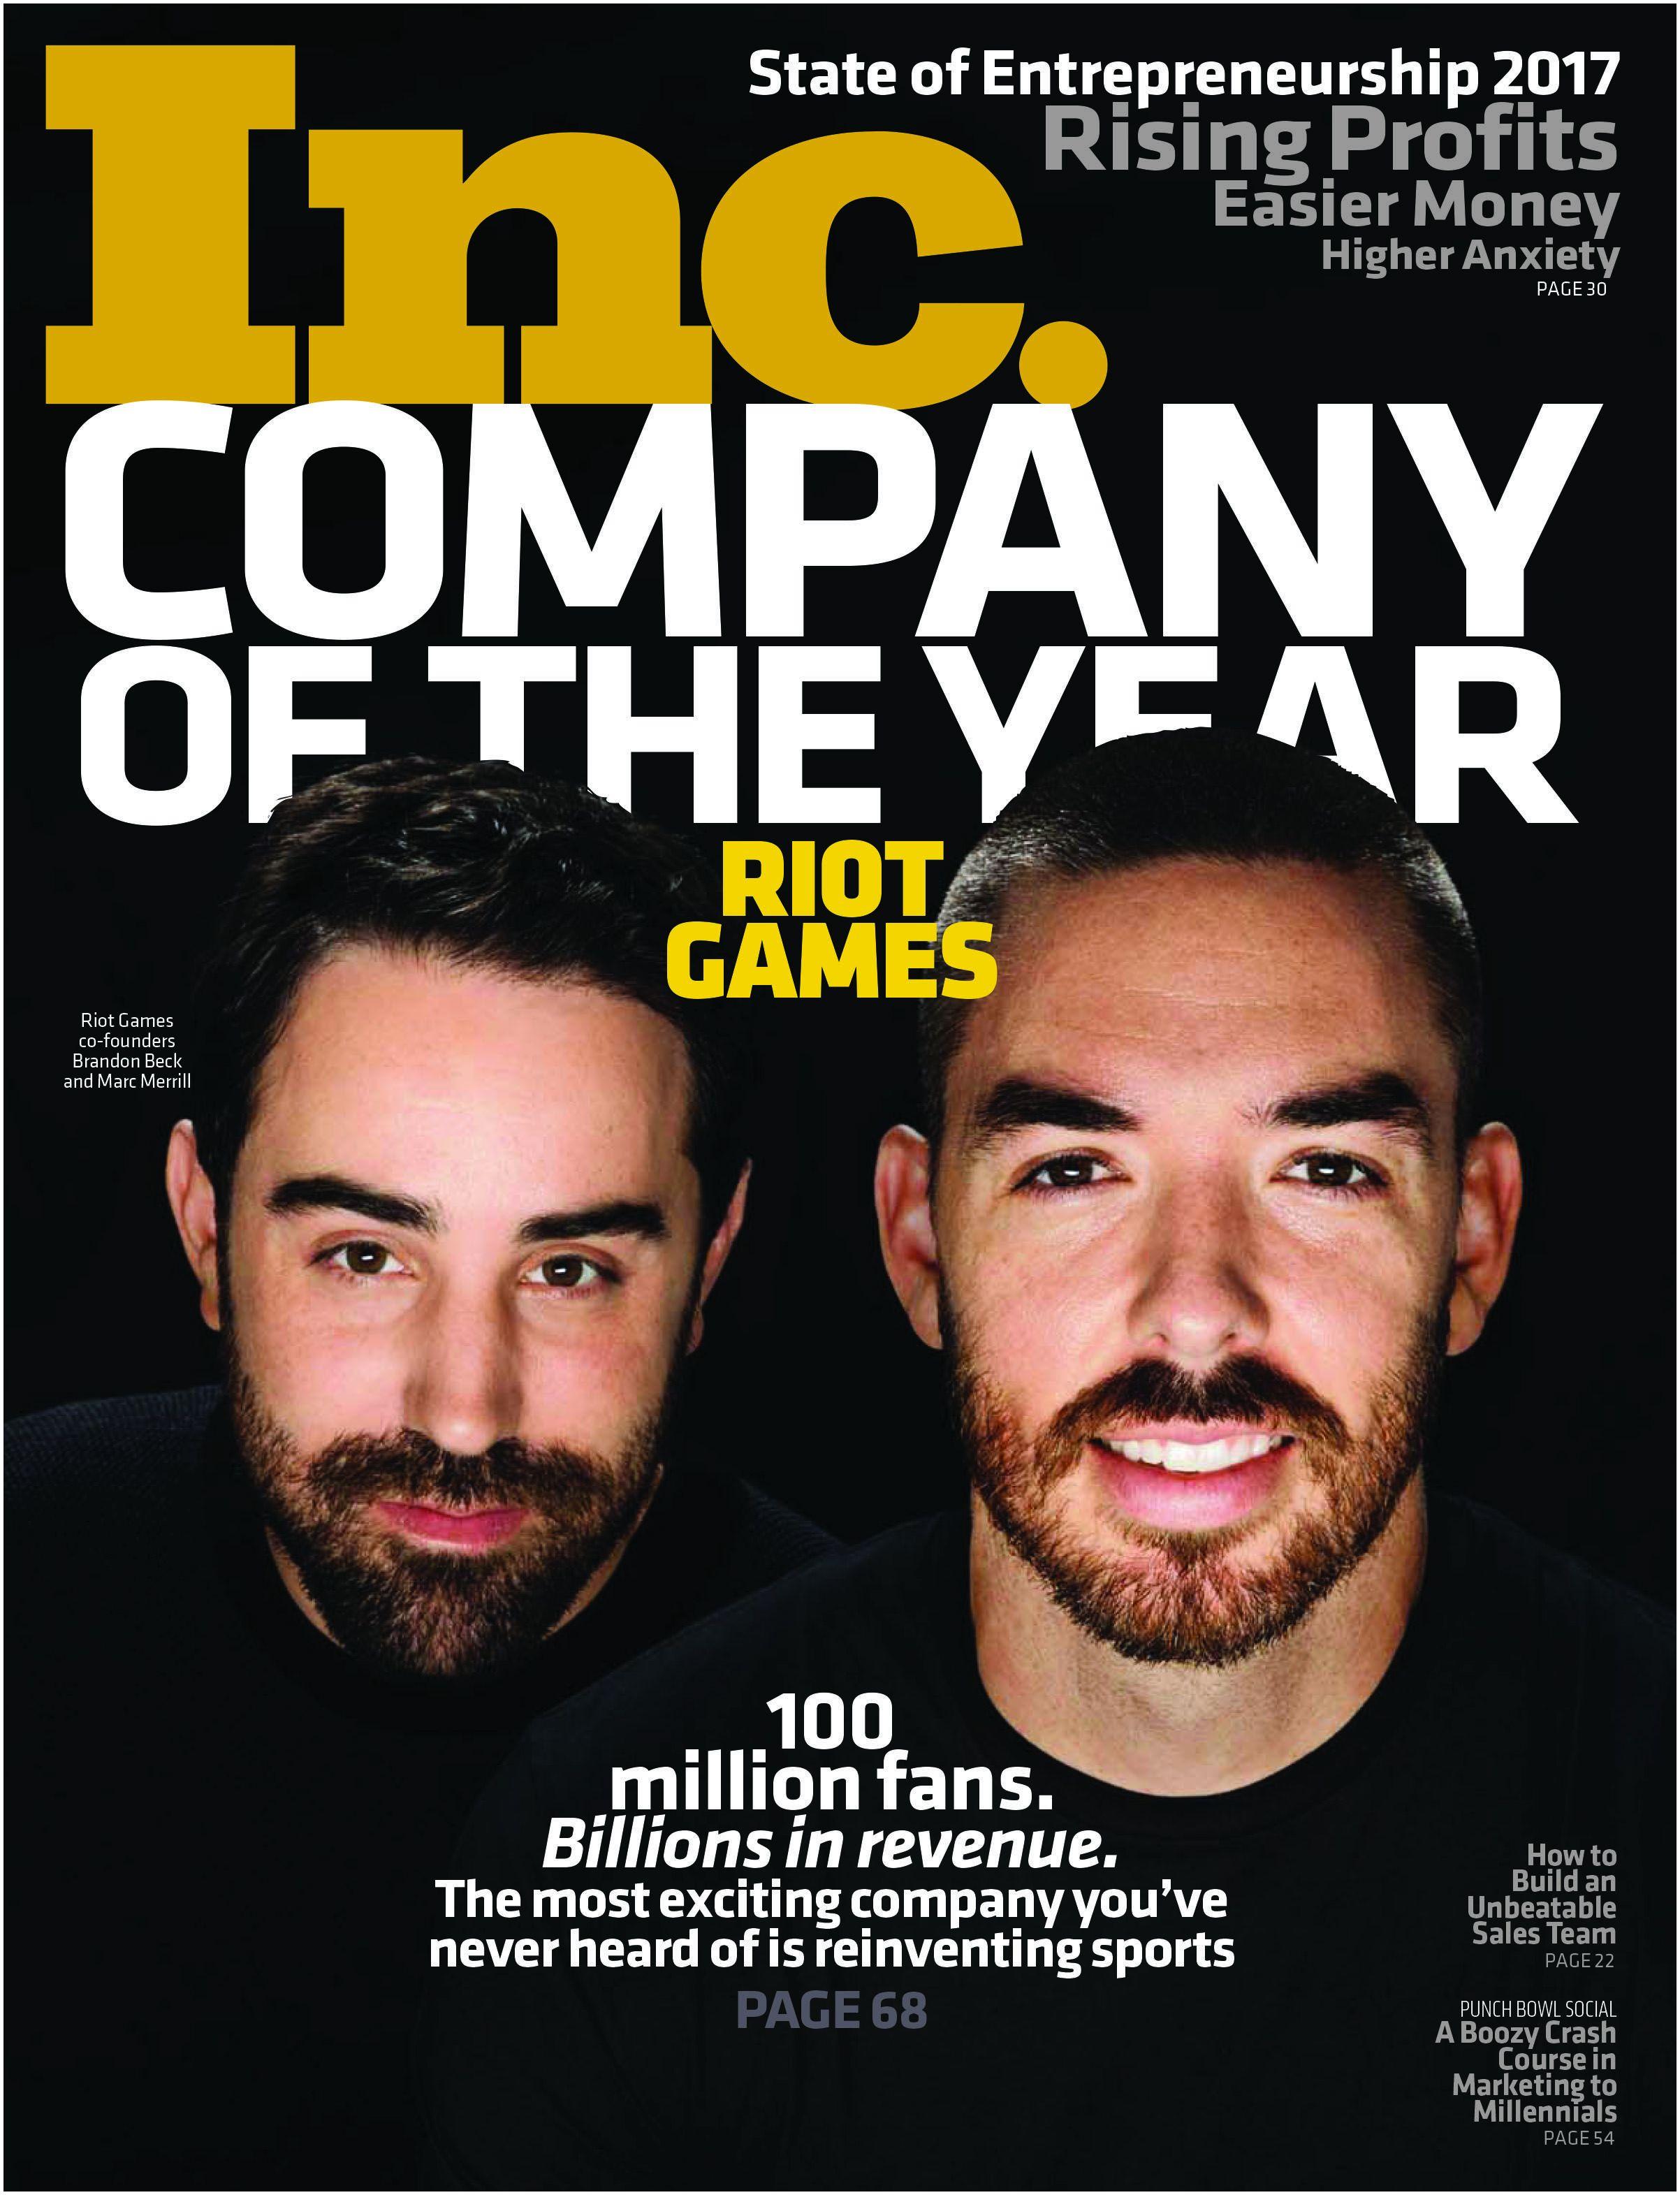 Fast Company Magazine Covers Pin by Education Finance Merce & Innovation On Inc Magazine